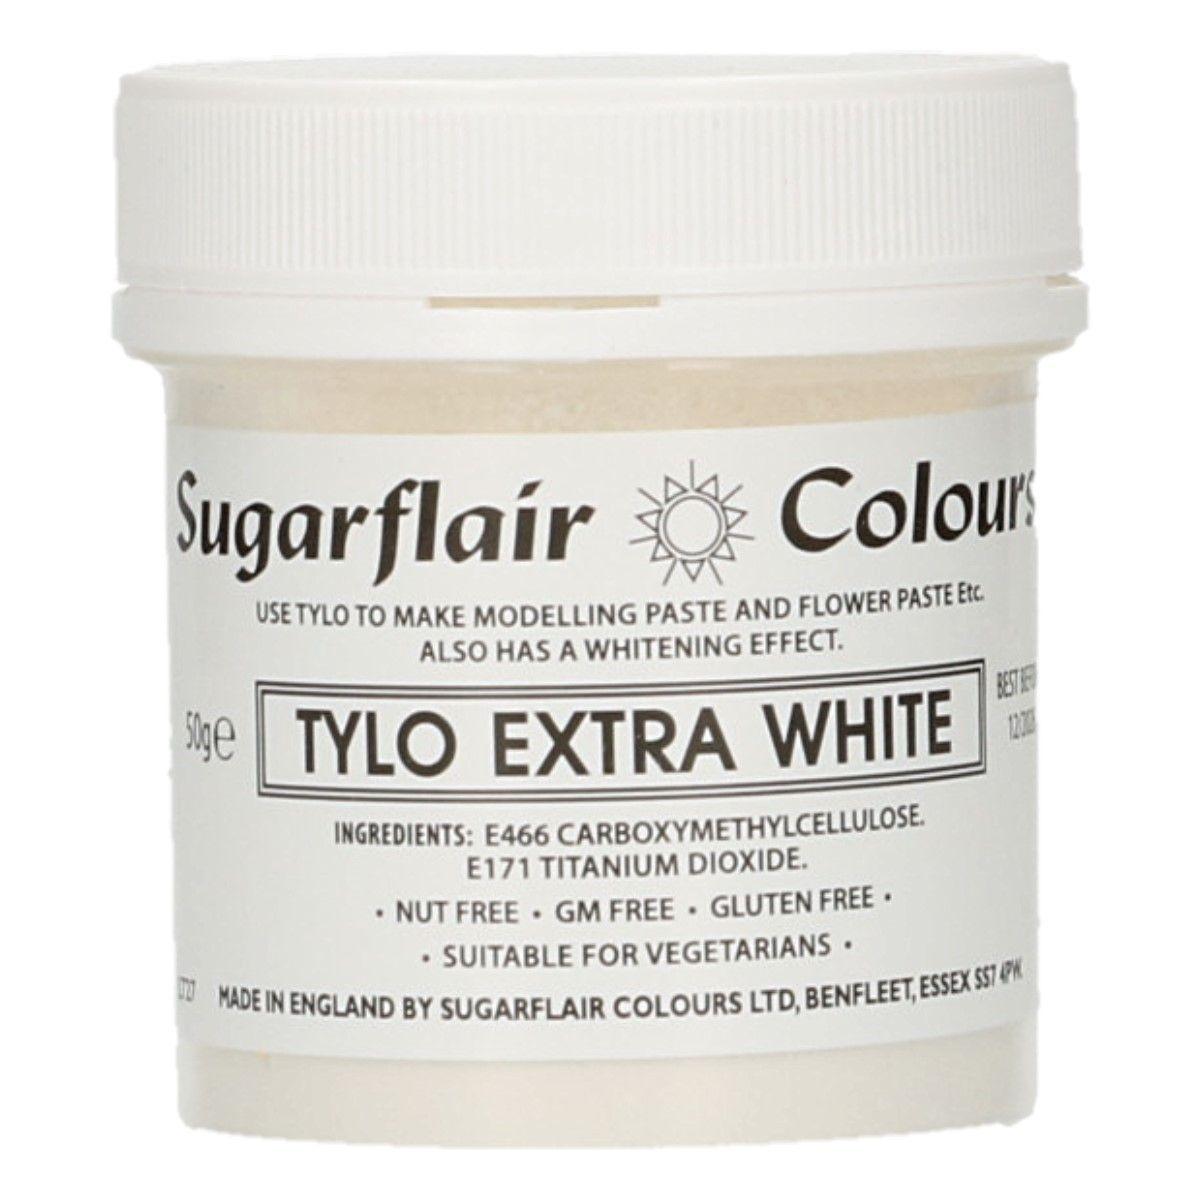 /s/u/sugarflair_tylo_extra_white_50g.jpg